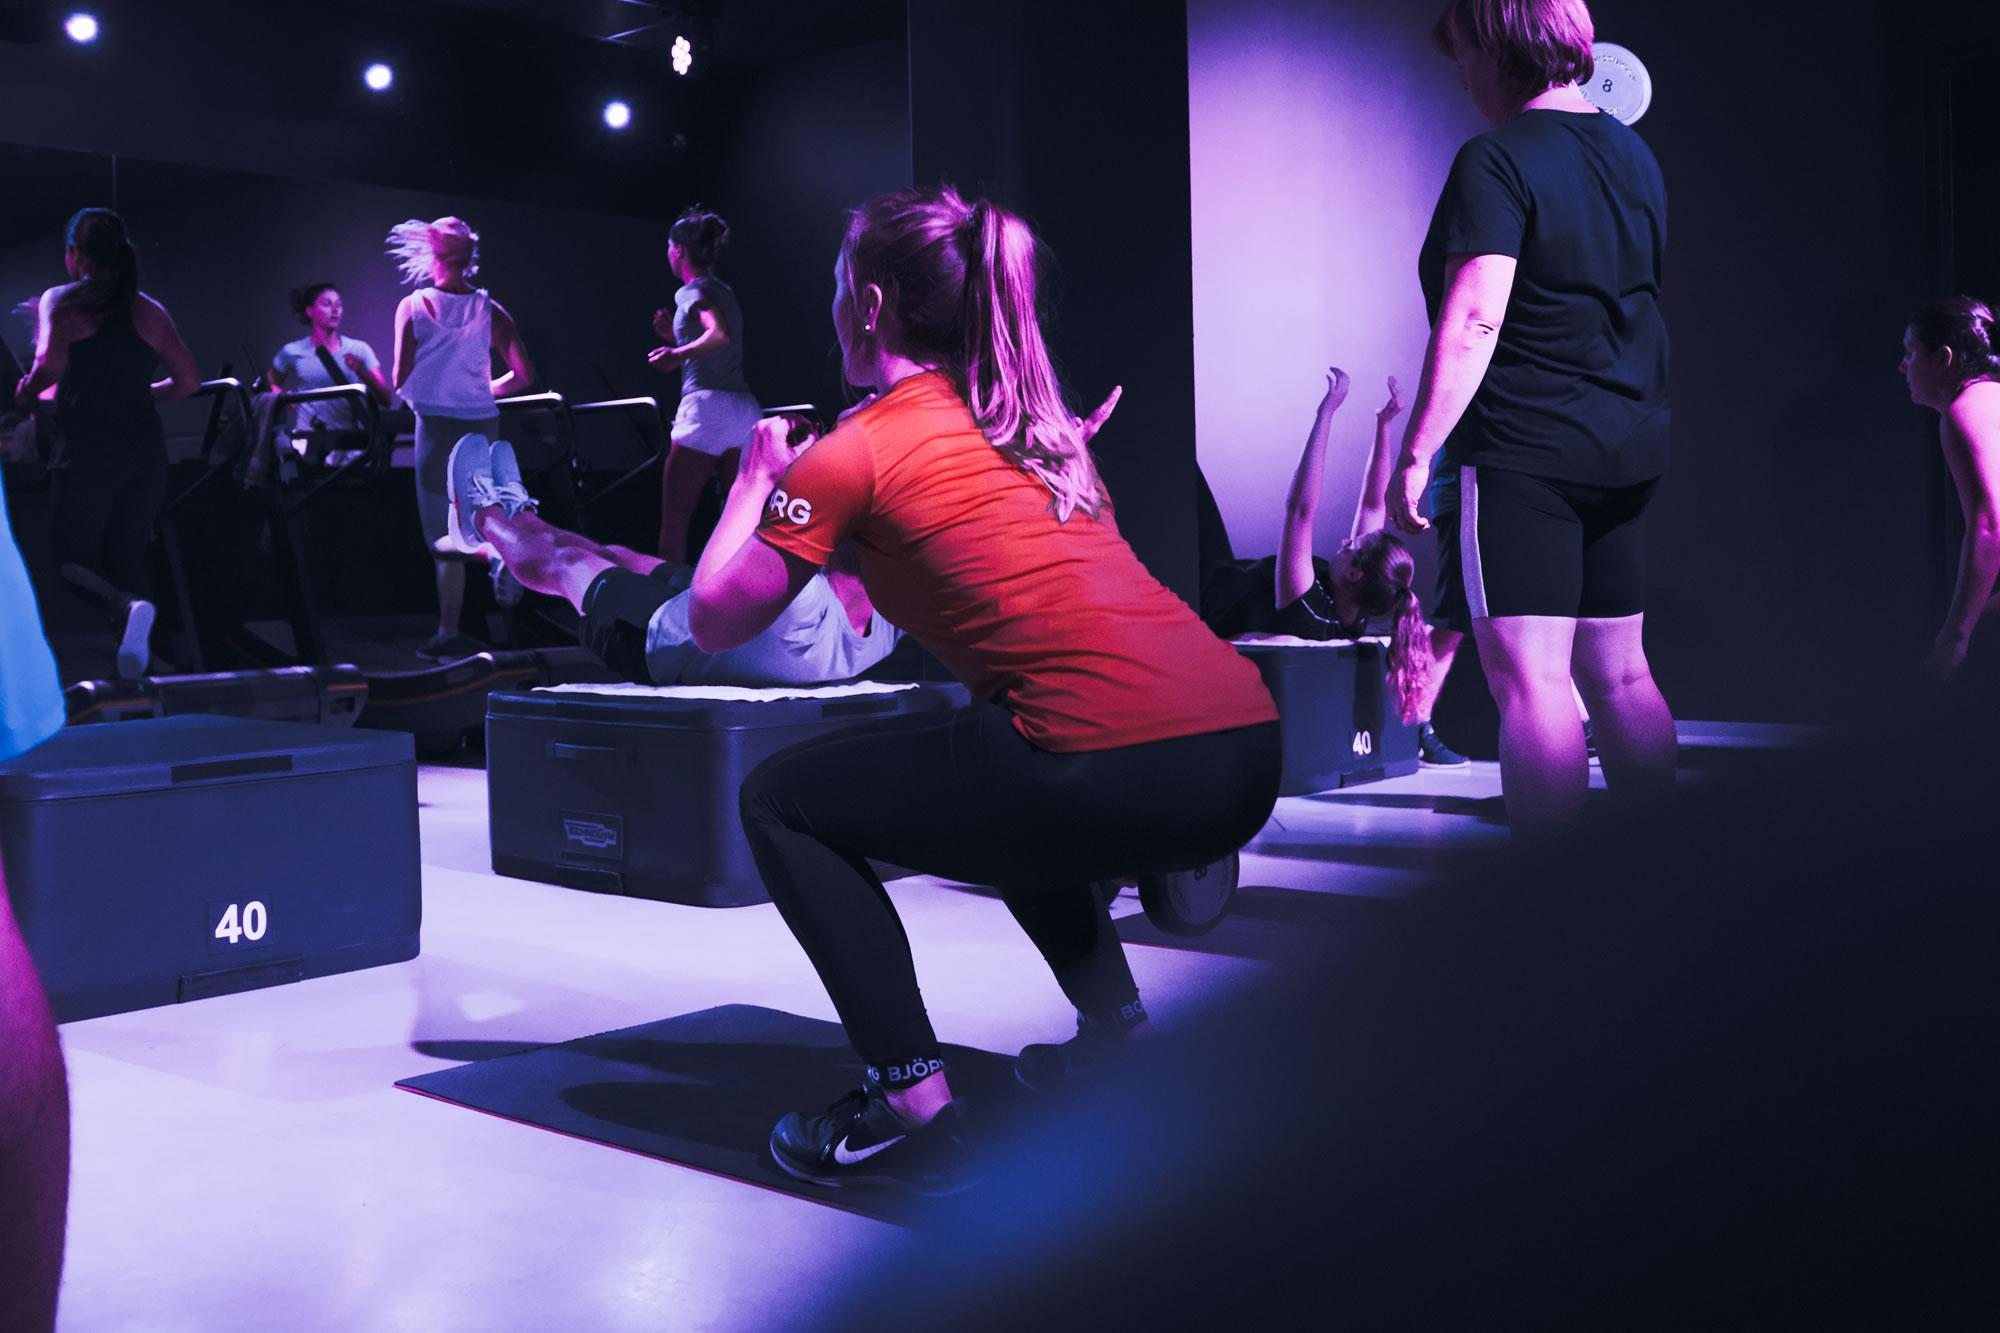 Full-body workout bij Ctrl Gym in Brugge